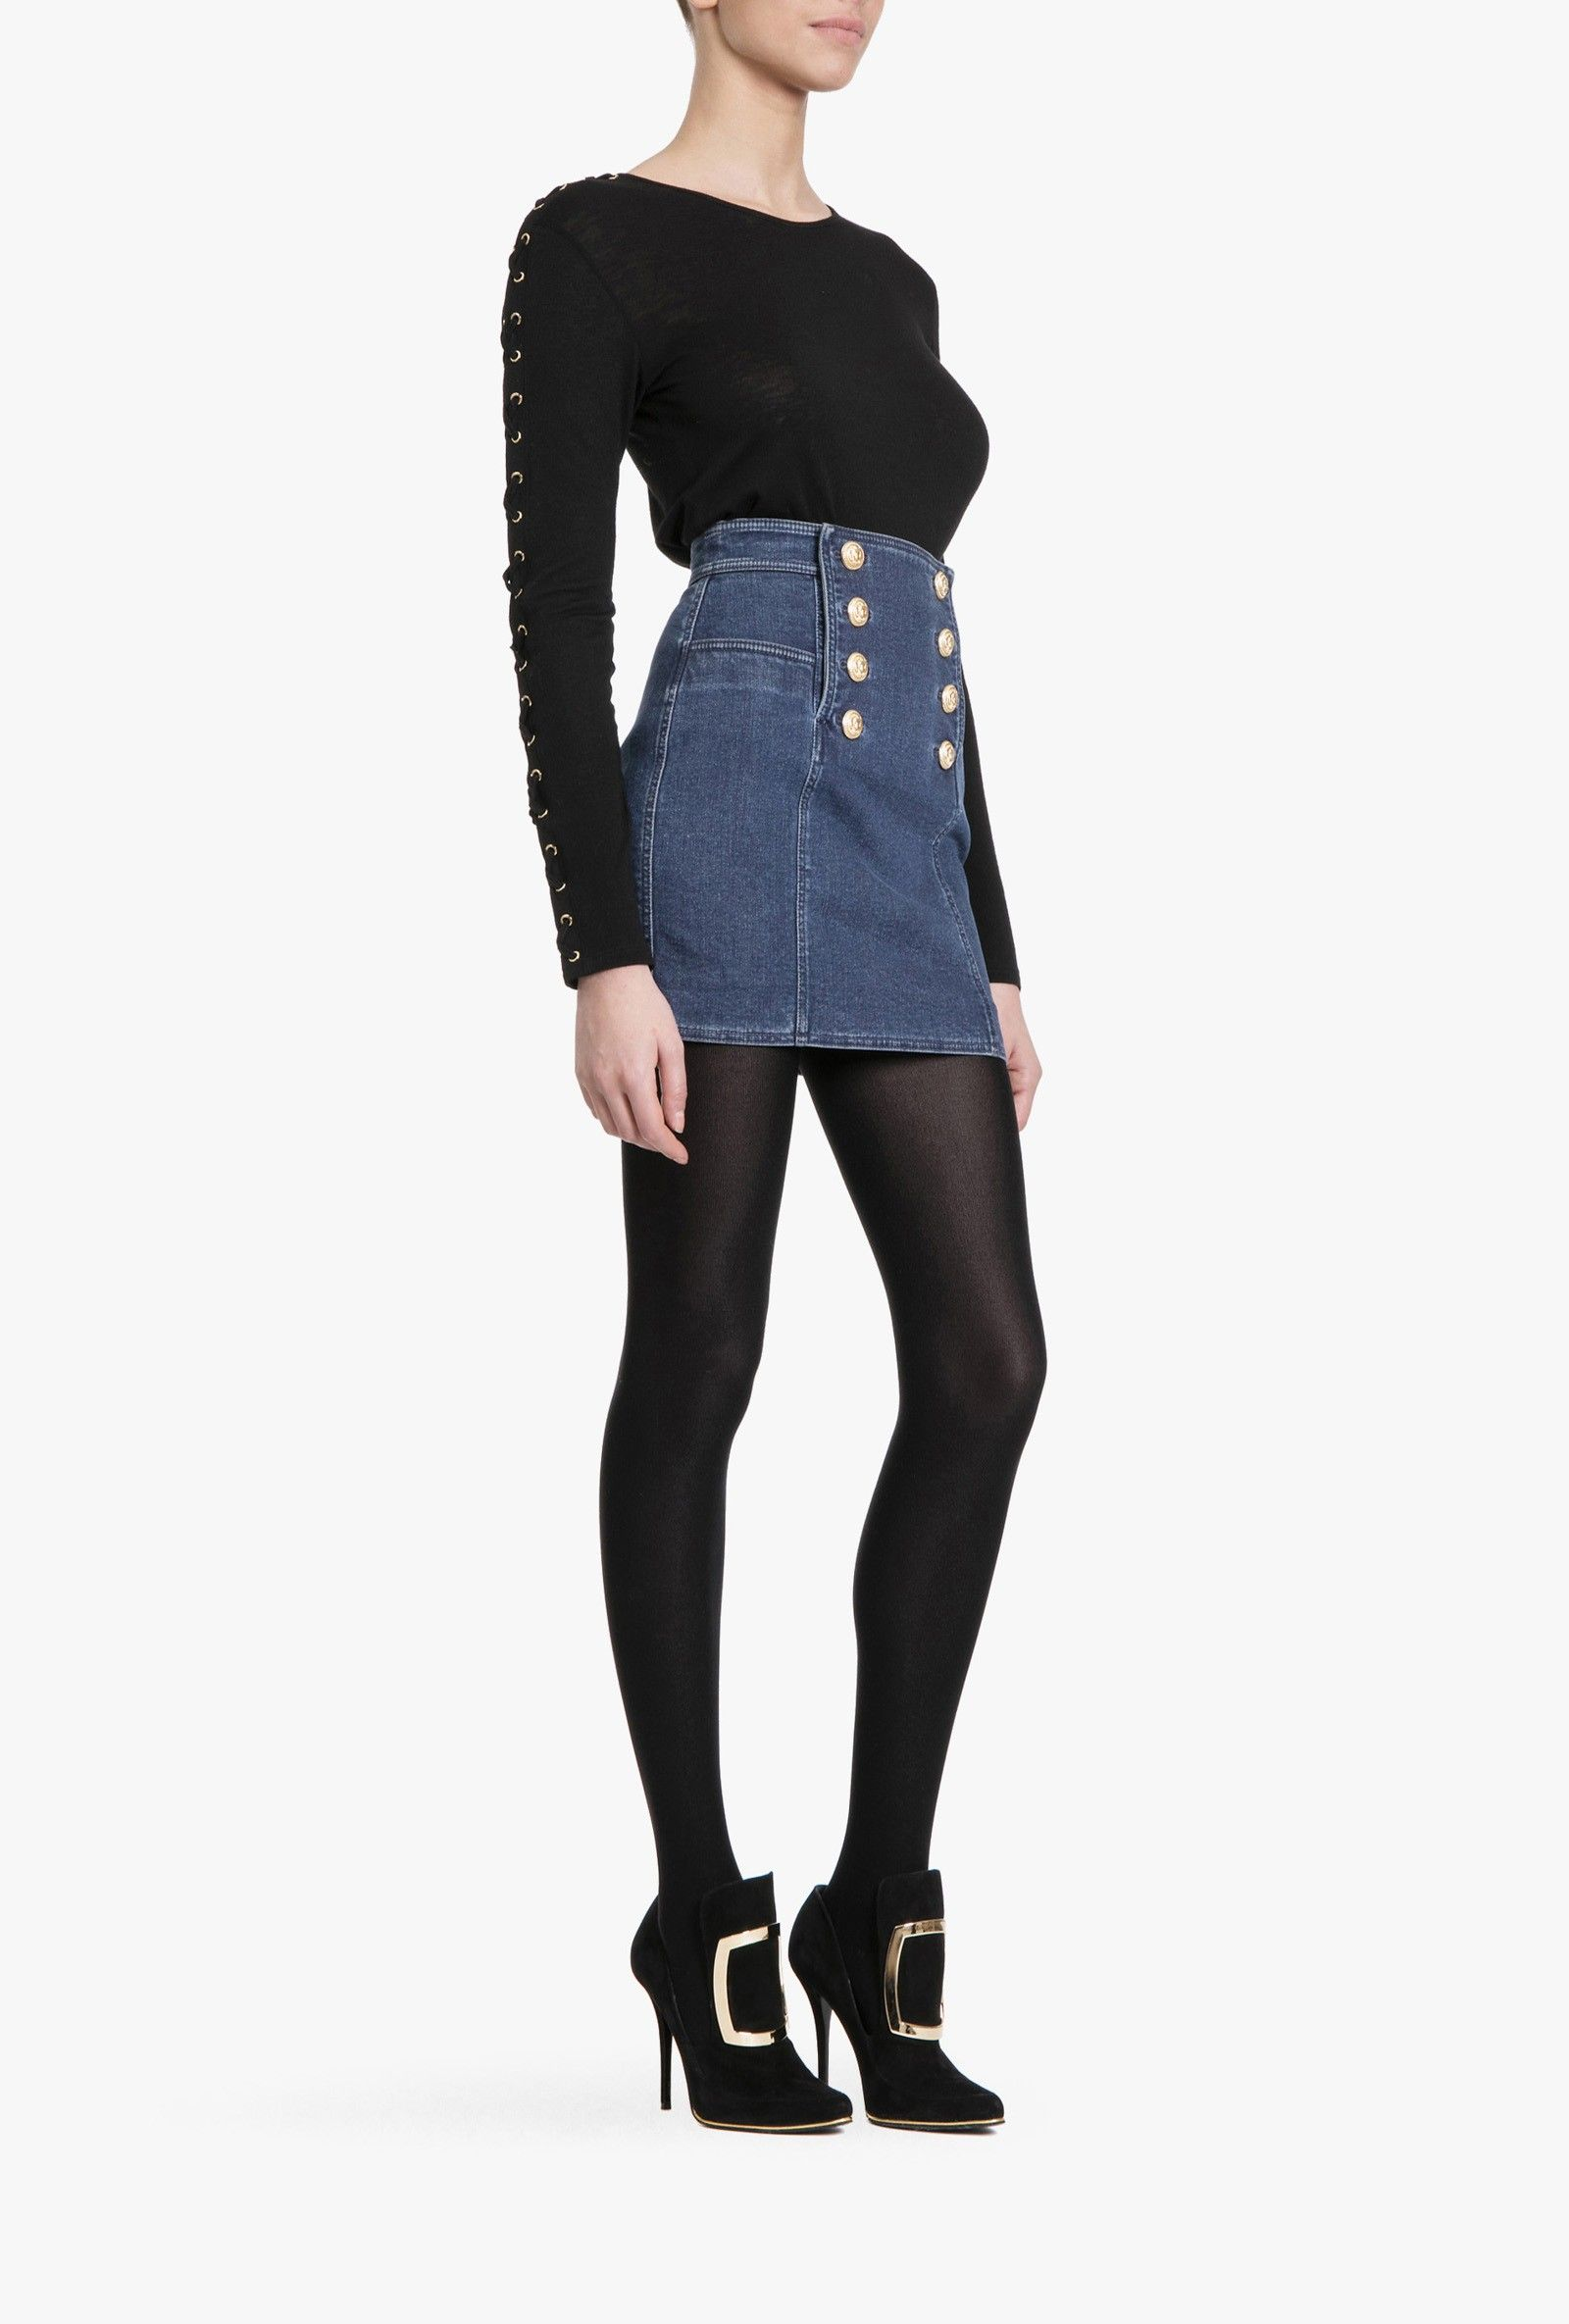 Viscose and wool jersey lace-up top | Women's tops | Balmain